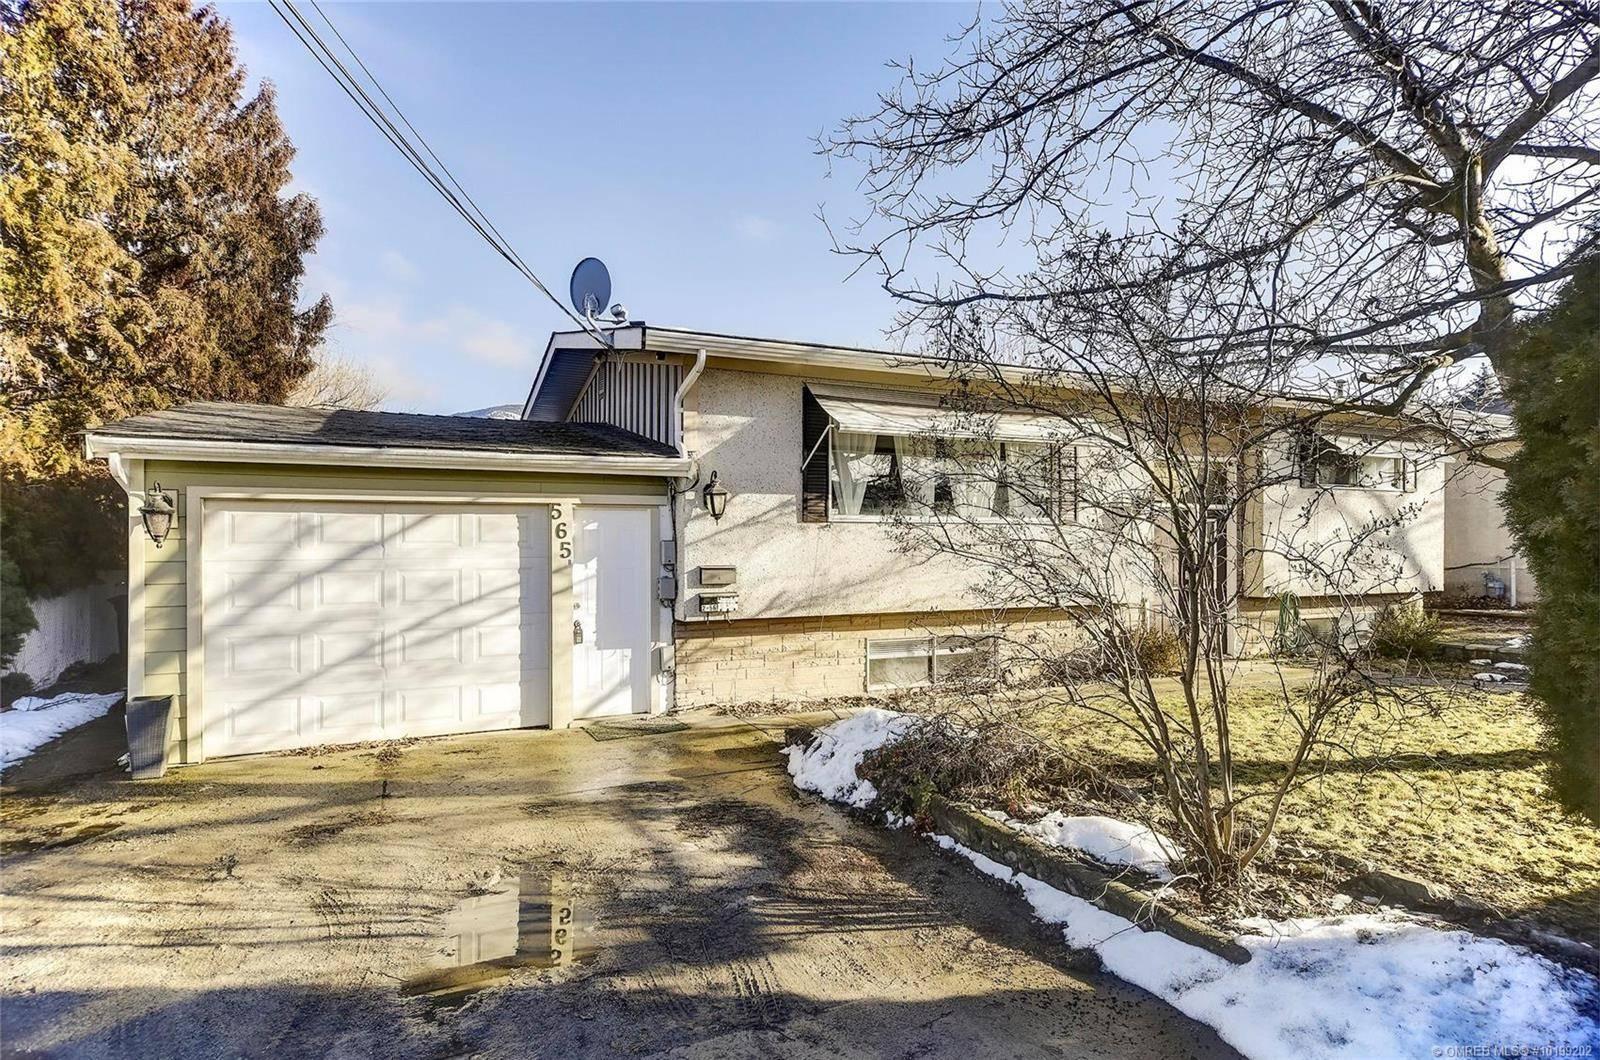 House for sale at 565 Rutland Rd South Kelowna British Columbia - MLS: 10199202